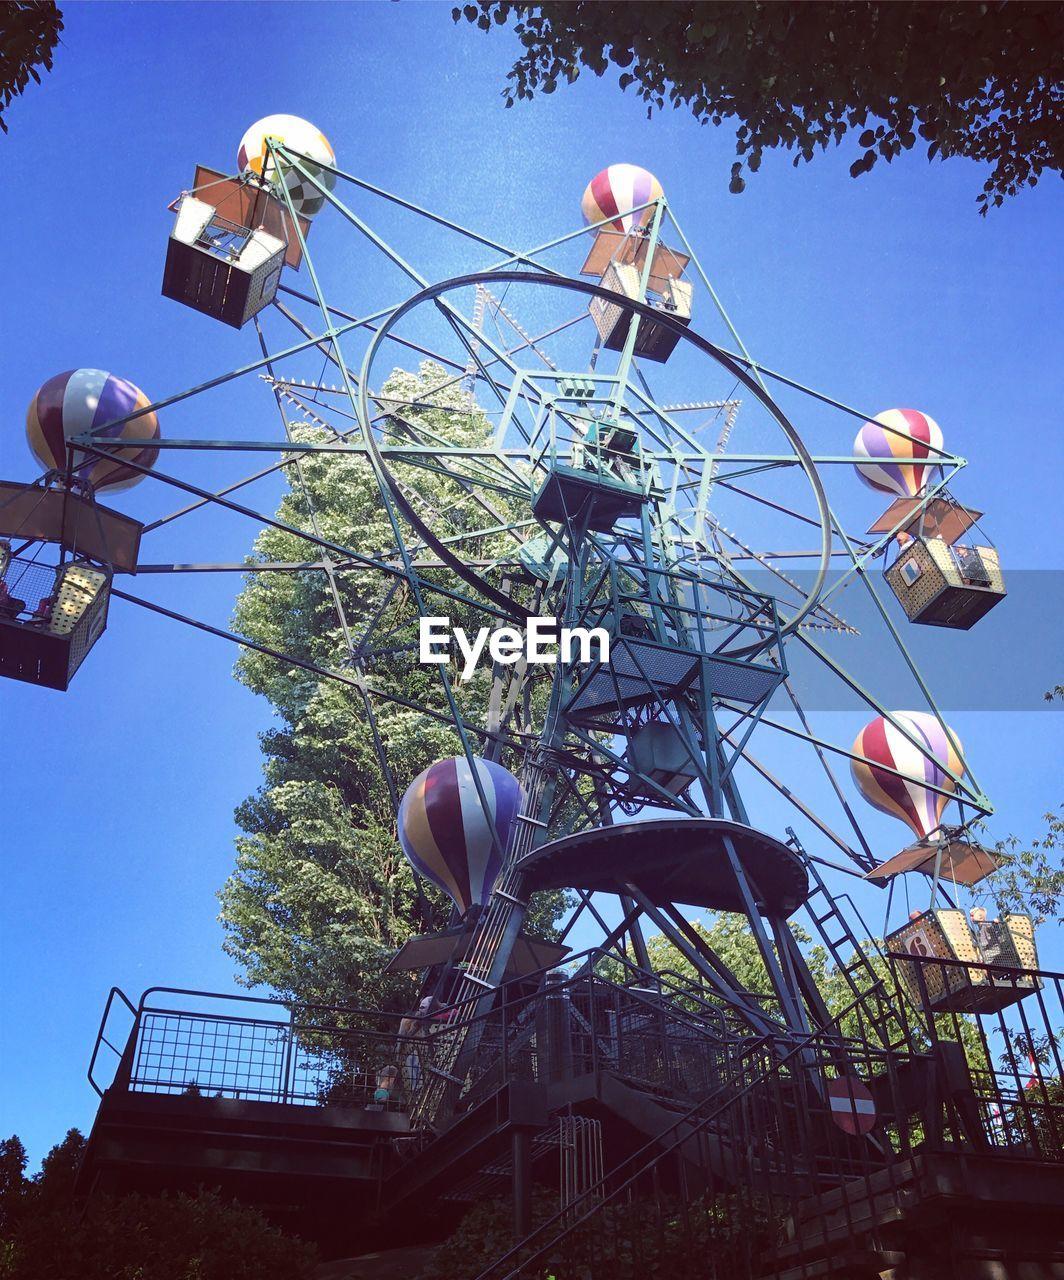 amusement park, low angle view, amusement park ride, arts culture and entertainment, day, sky, outdoors, built structure, clear sky, blue, ferris wheel, tree, no people, architecture